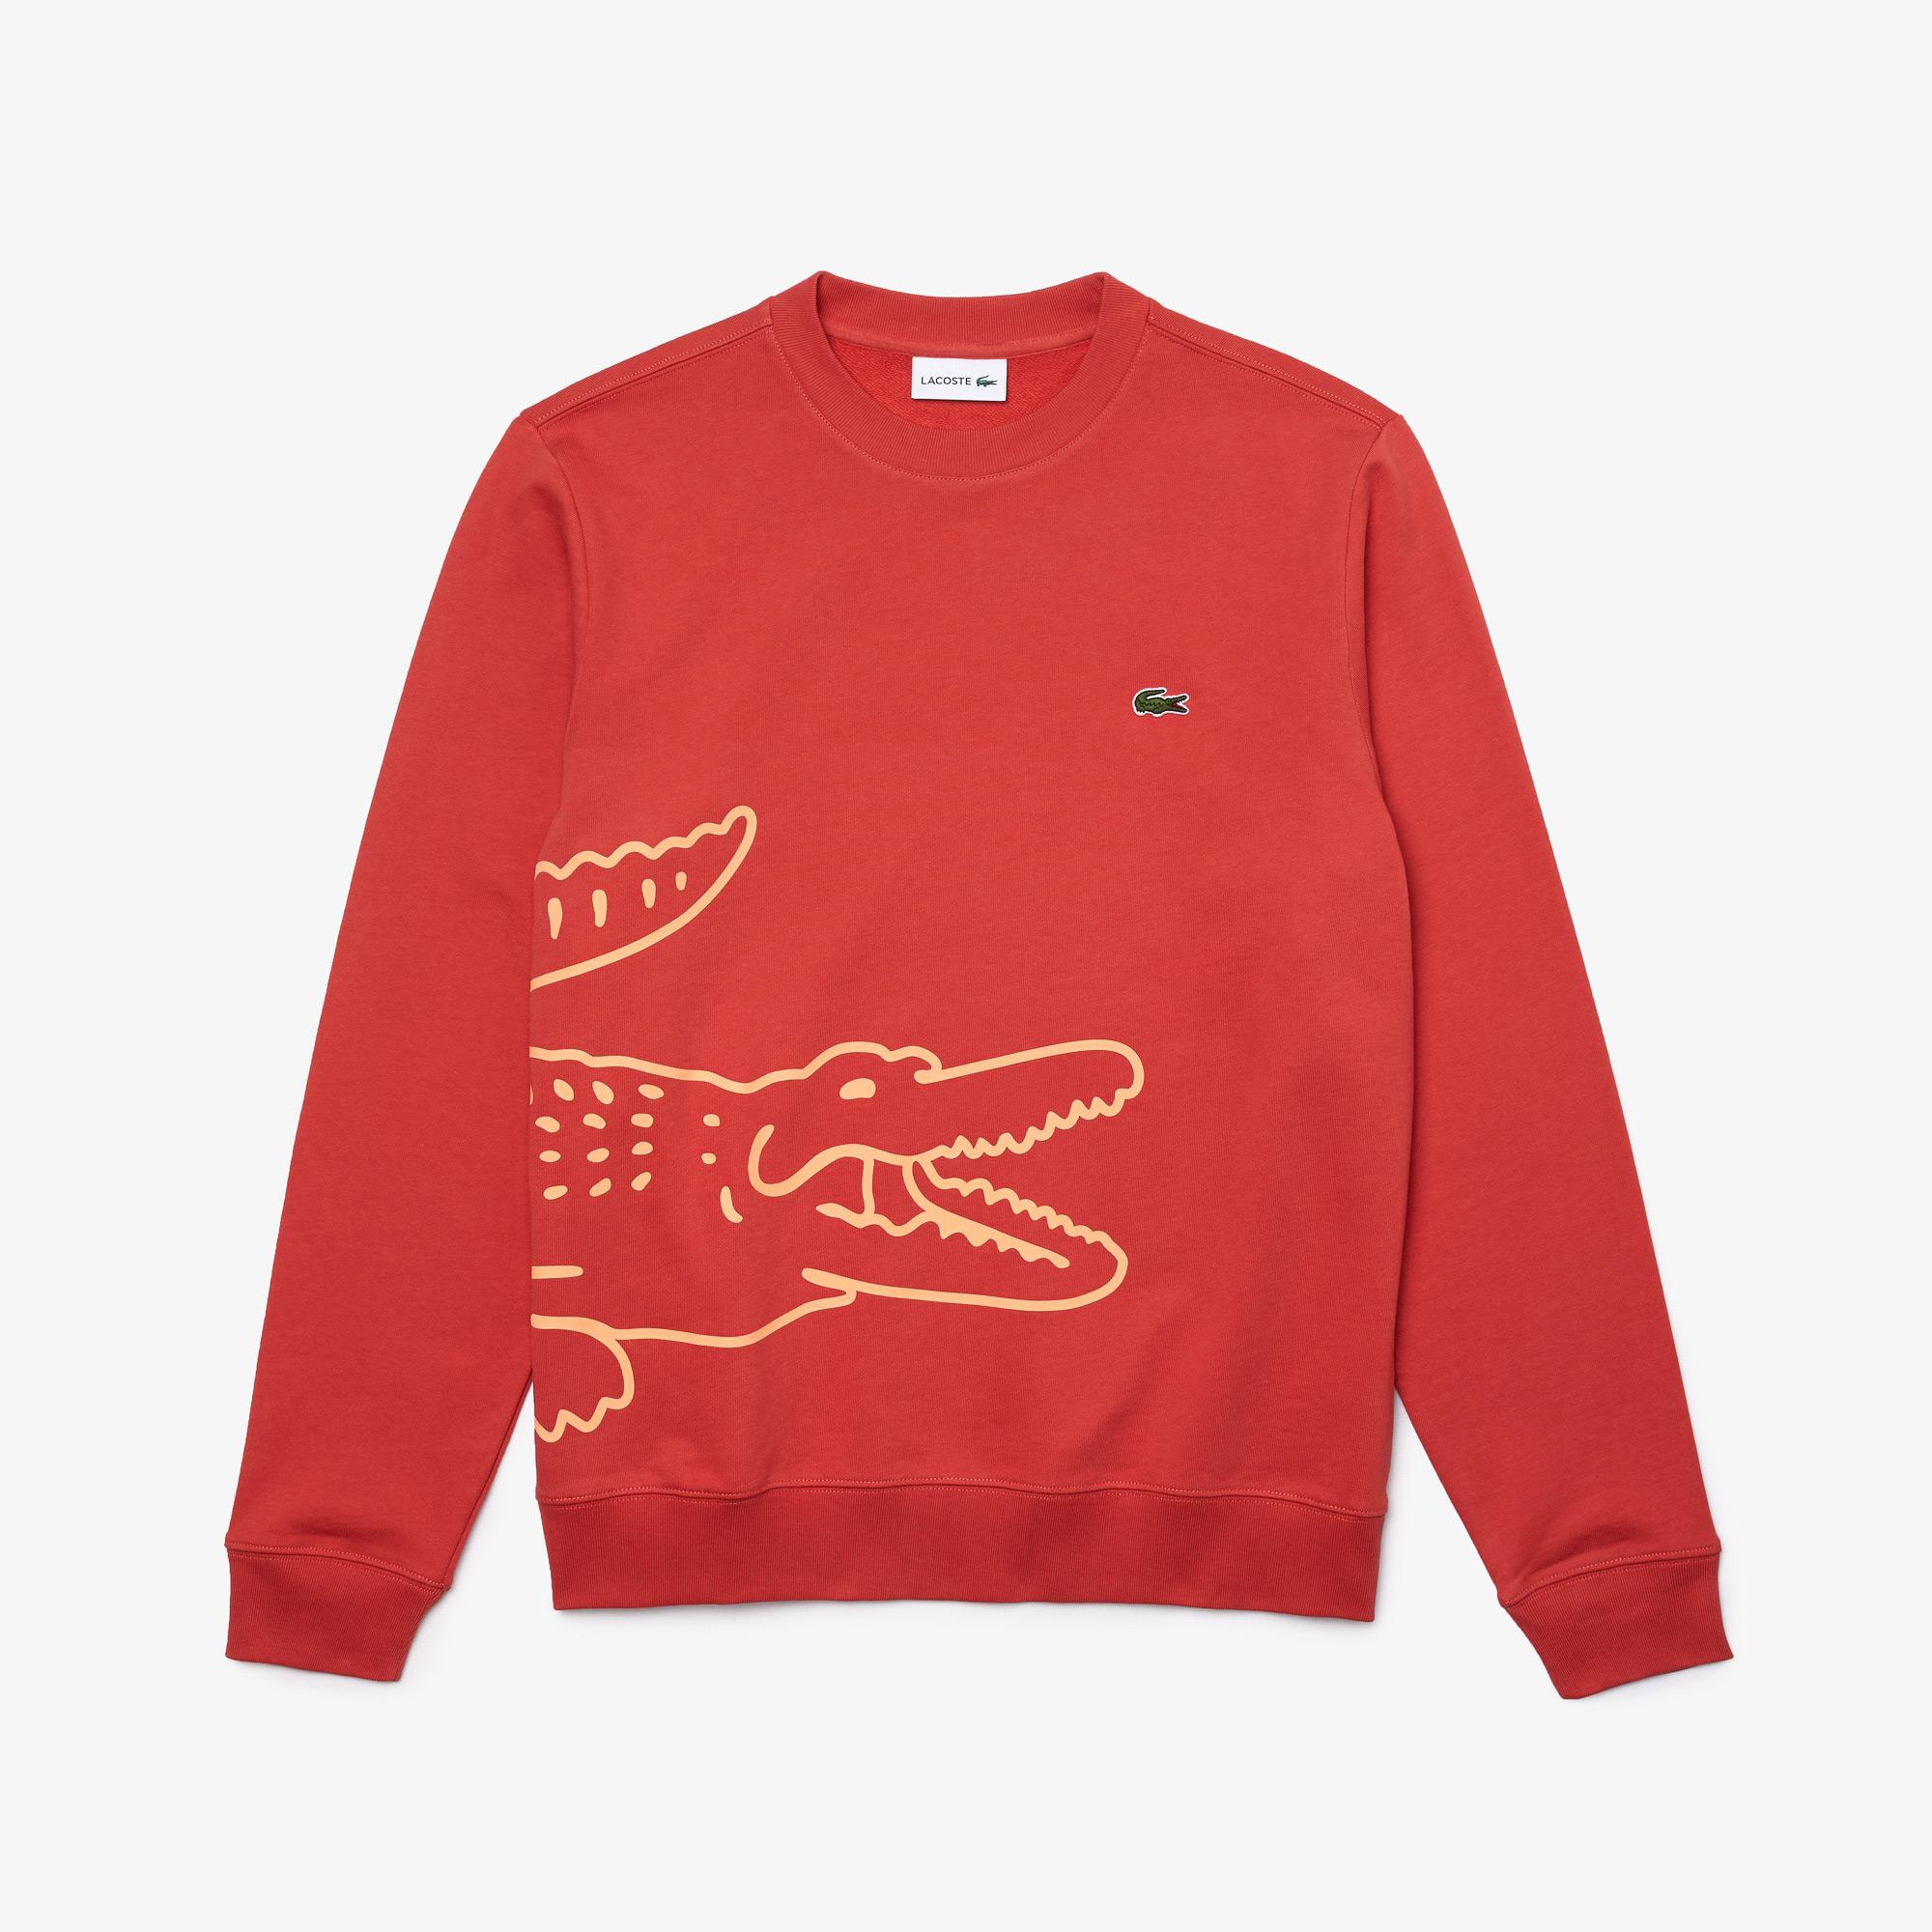 Lacoste Men's Crocodile Print Organic Cotton Fleece Sweatshirt